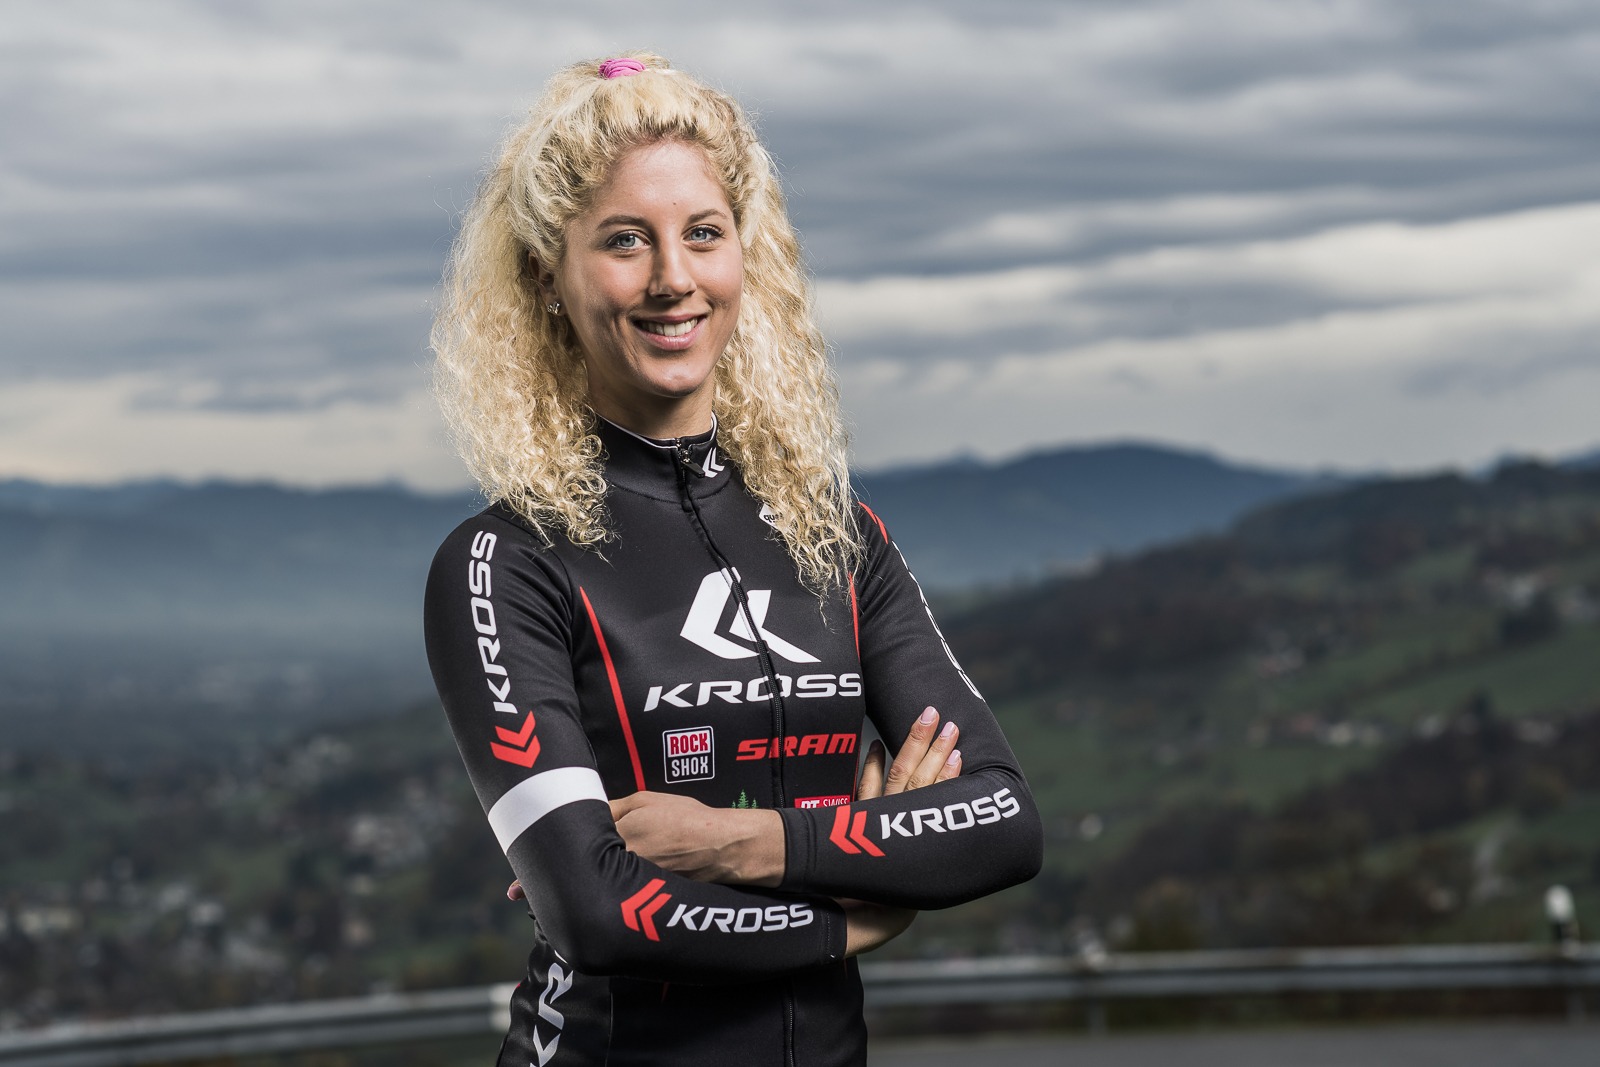 KROSS_Jolanda Neff joins Team_02